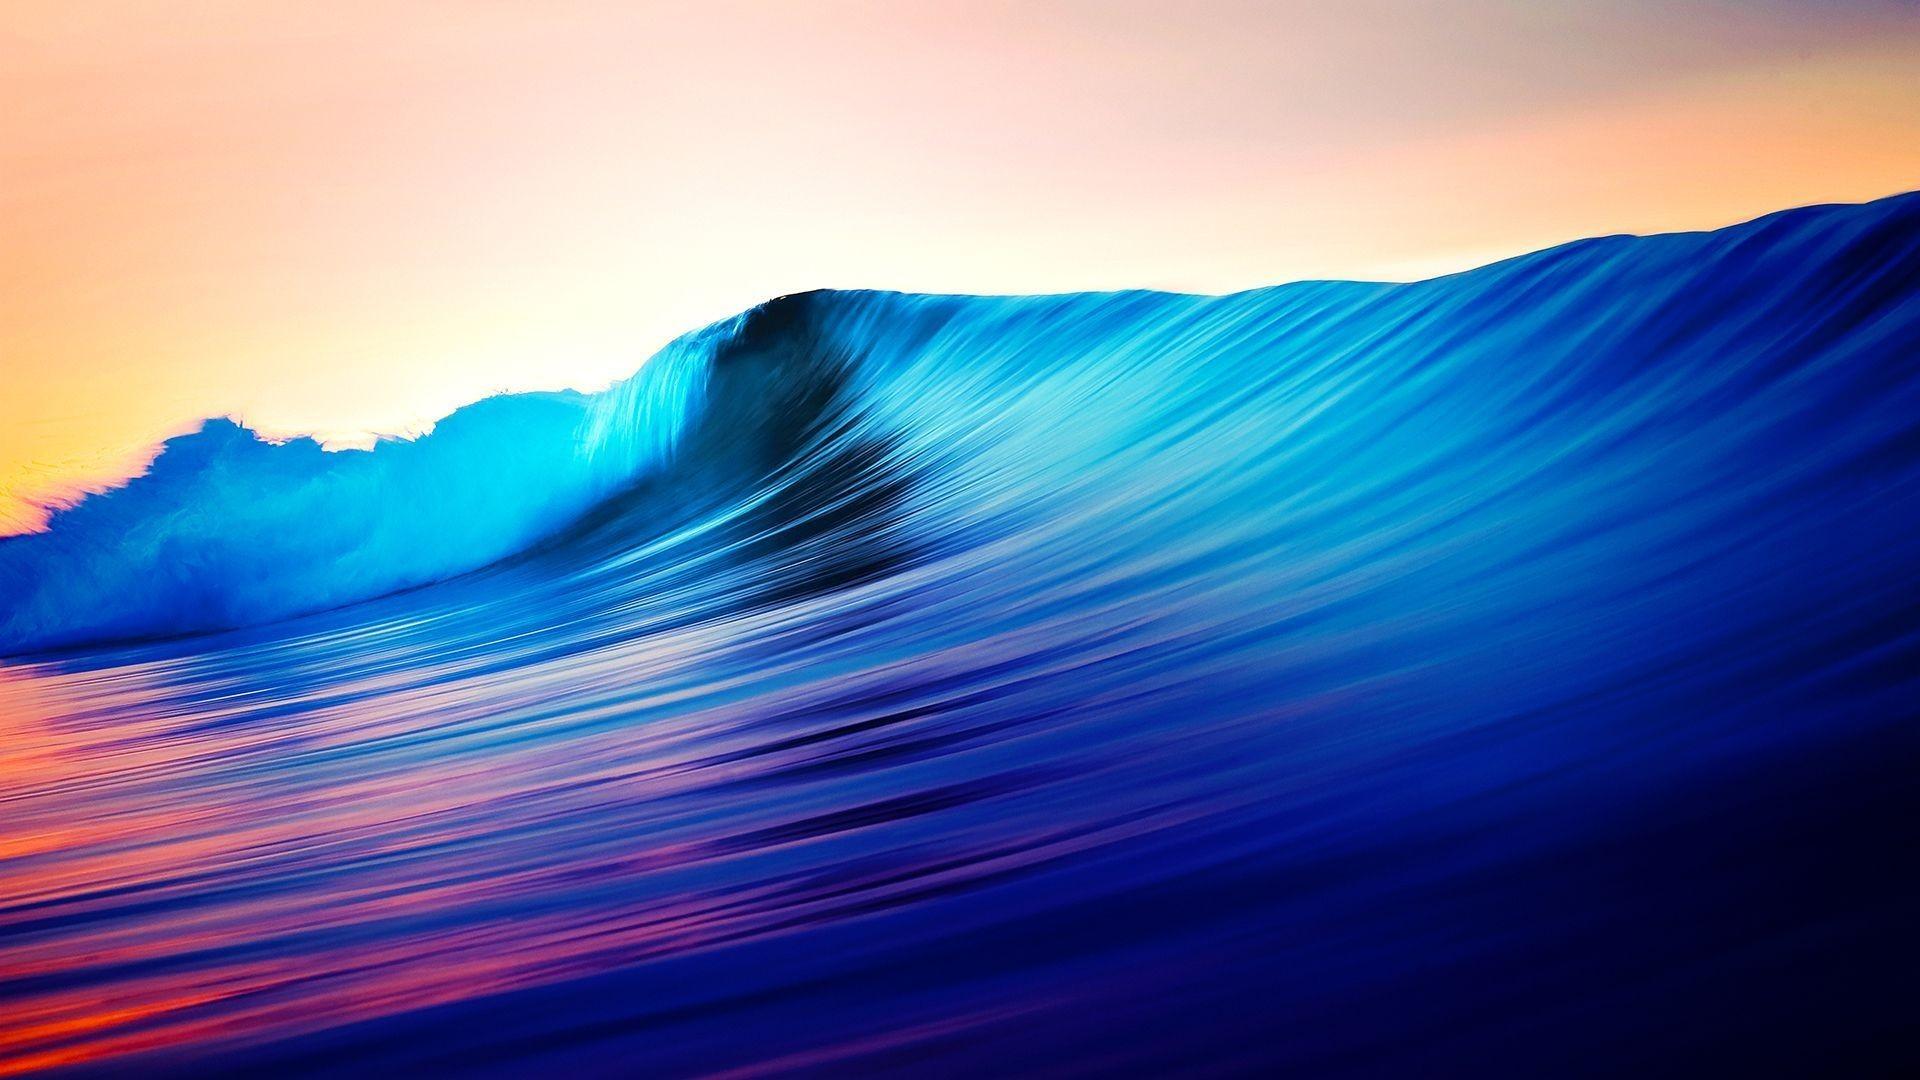 Beautiful Oceans Sea Shiny Waves Nature Ocean Wallpaper Ios – 1920×1080